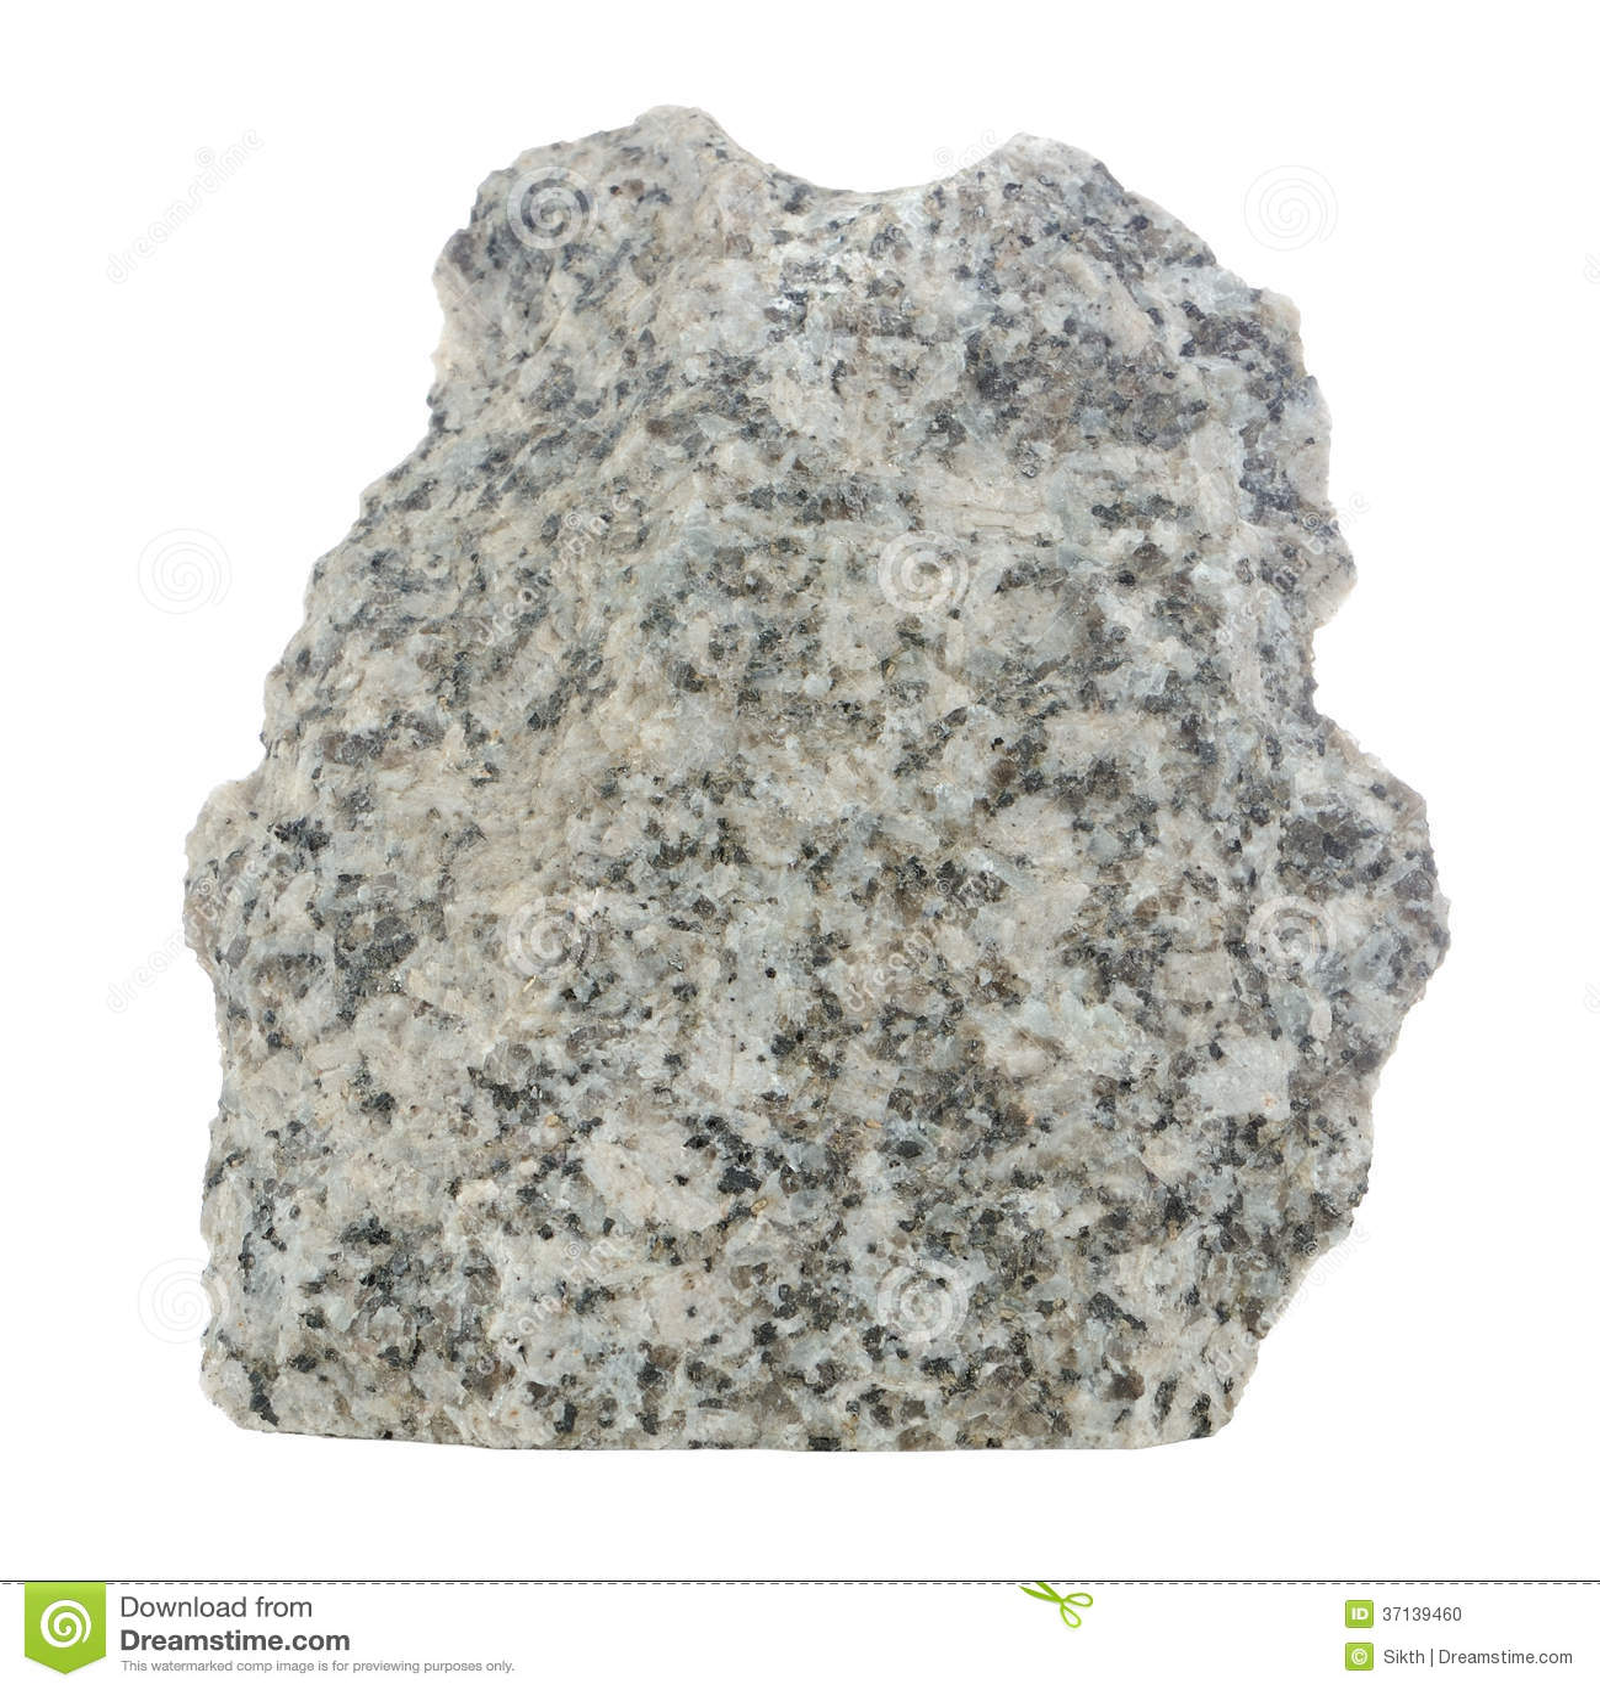 White Granite Rock : Grey granite stone isolated on white background stock